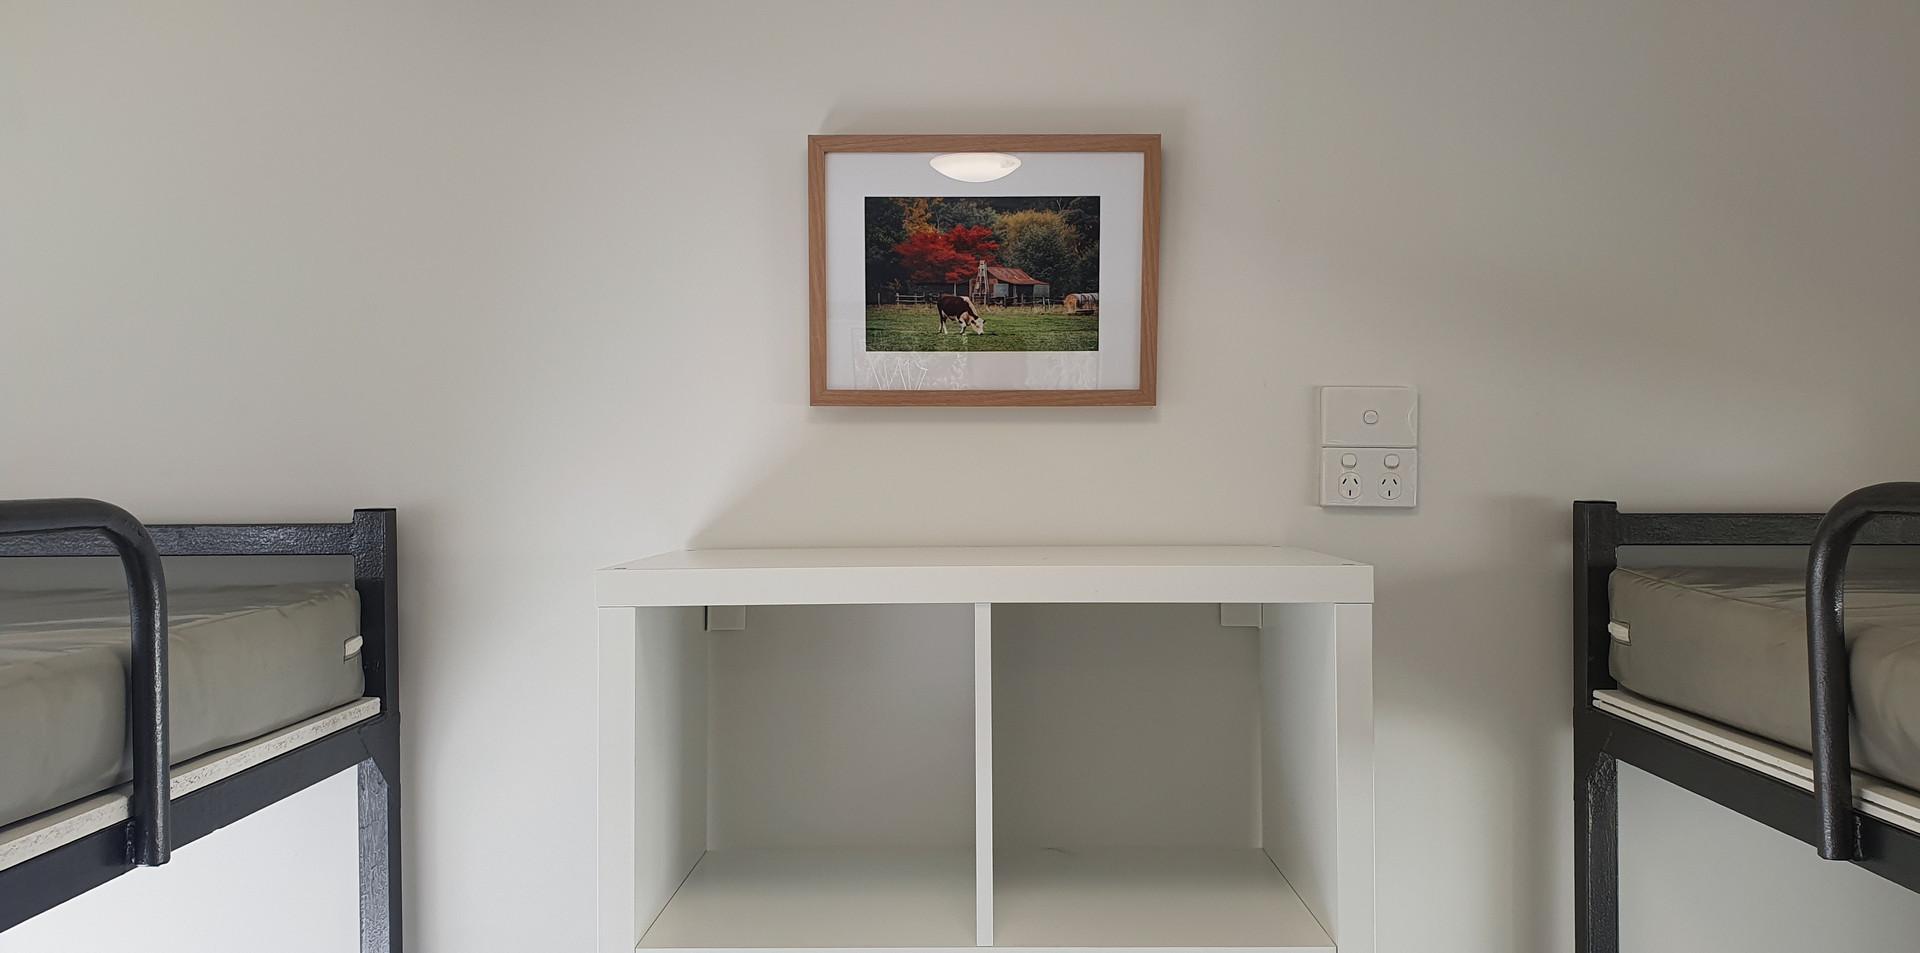 cow photo frame